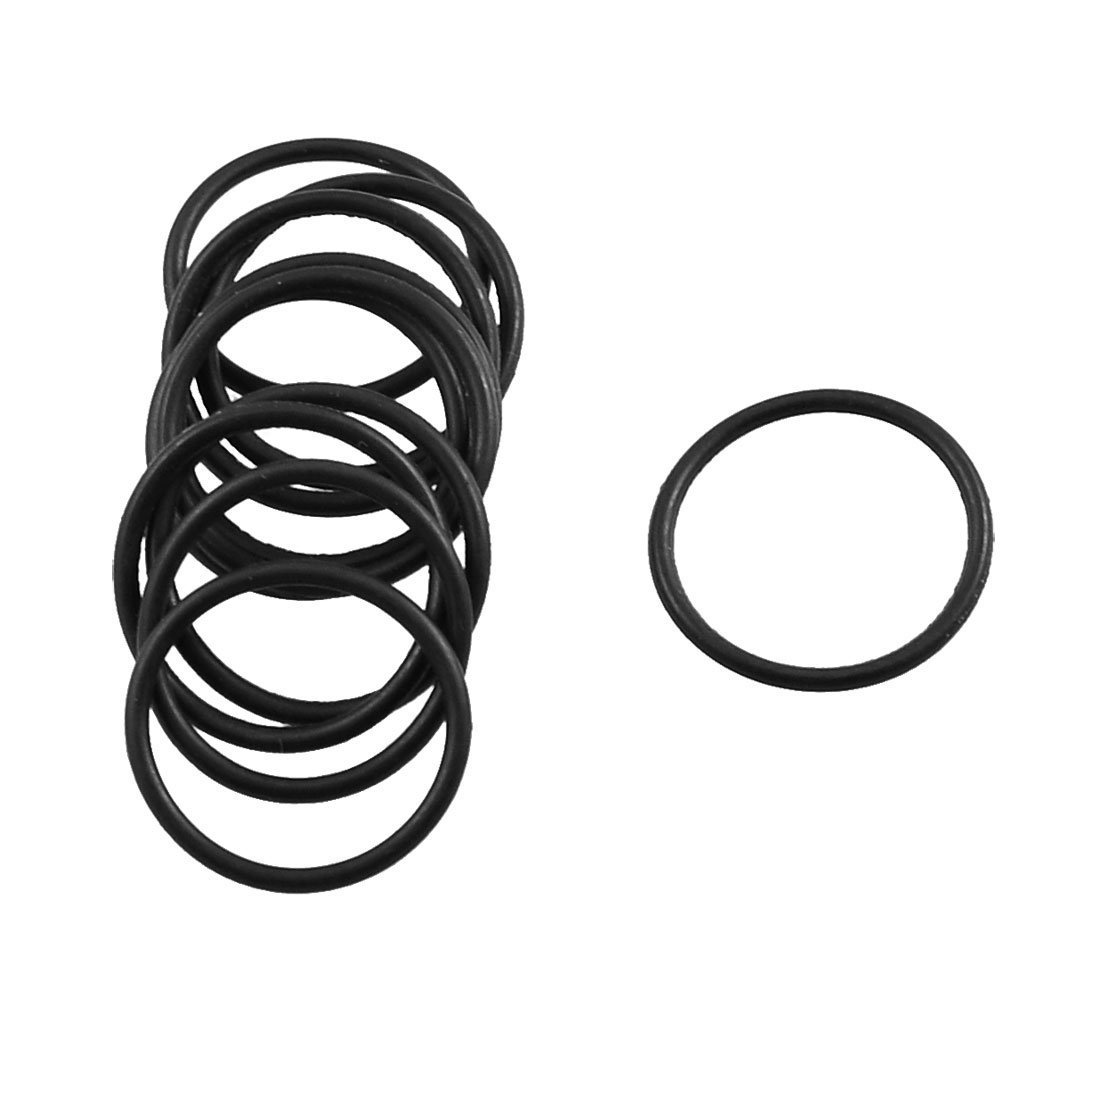 sourcingmap® 10 Pcs Black Rubber Oil Filter Sealing O Ring Gasket 20mm x 17mm x 1.5mm a12100800ux1087